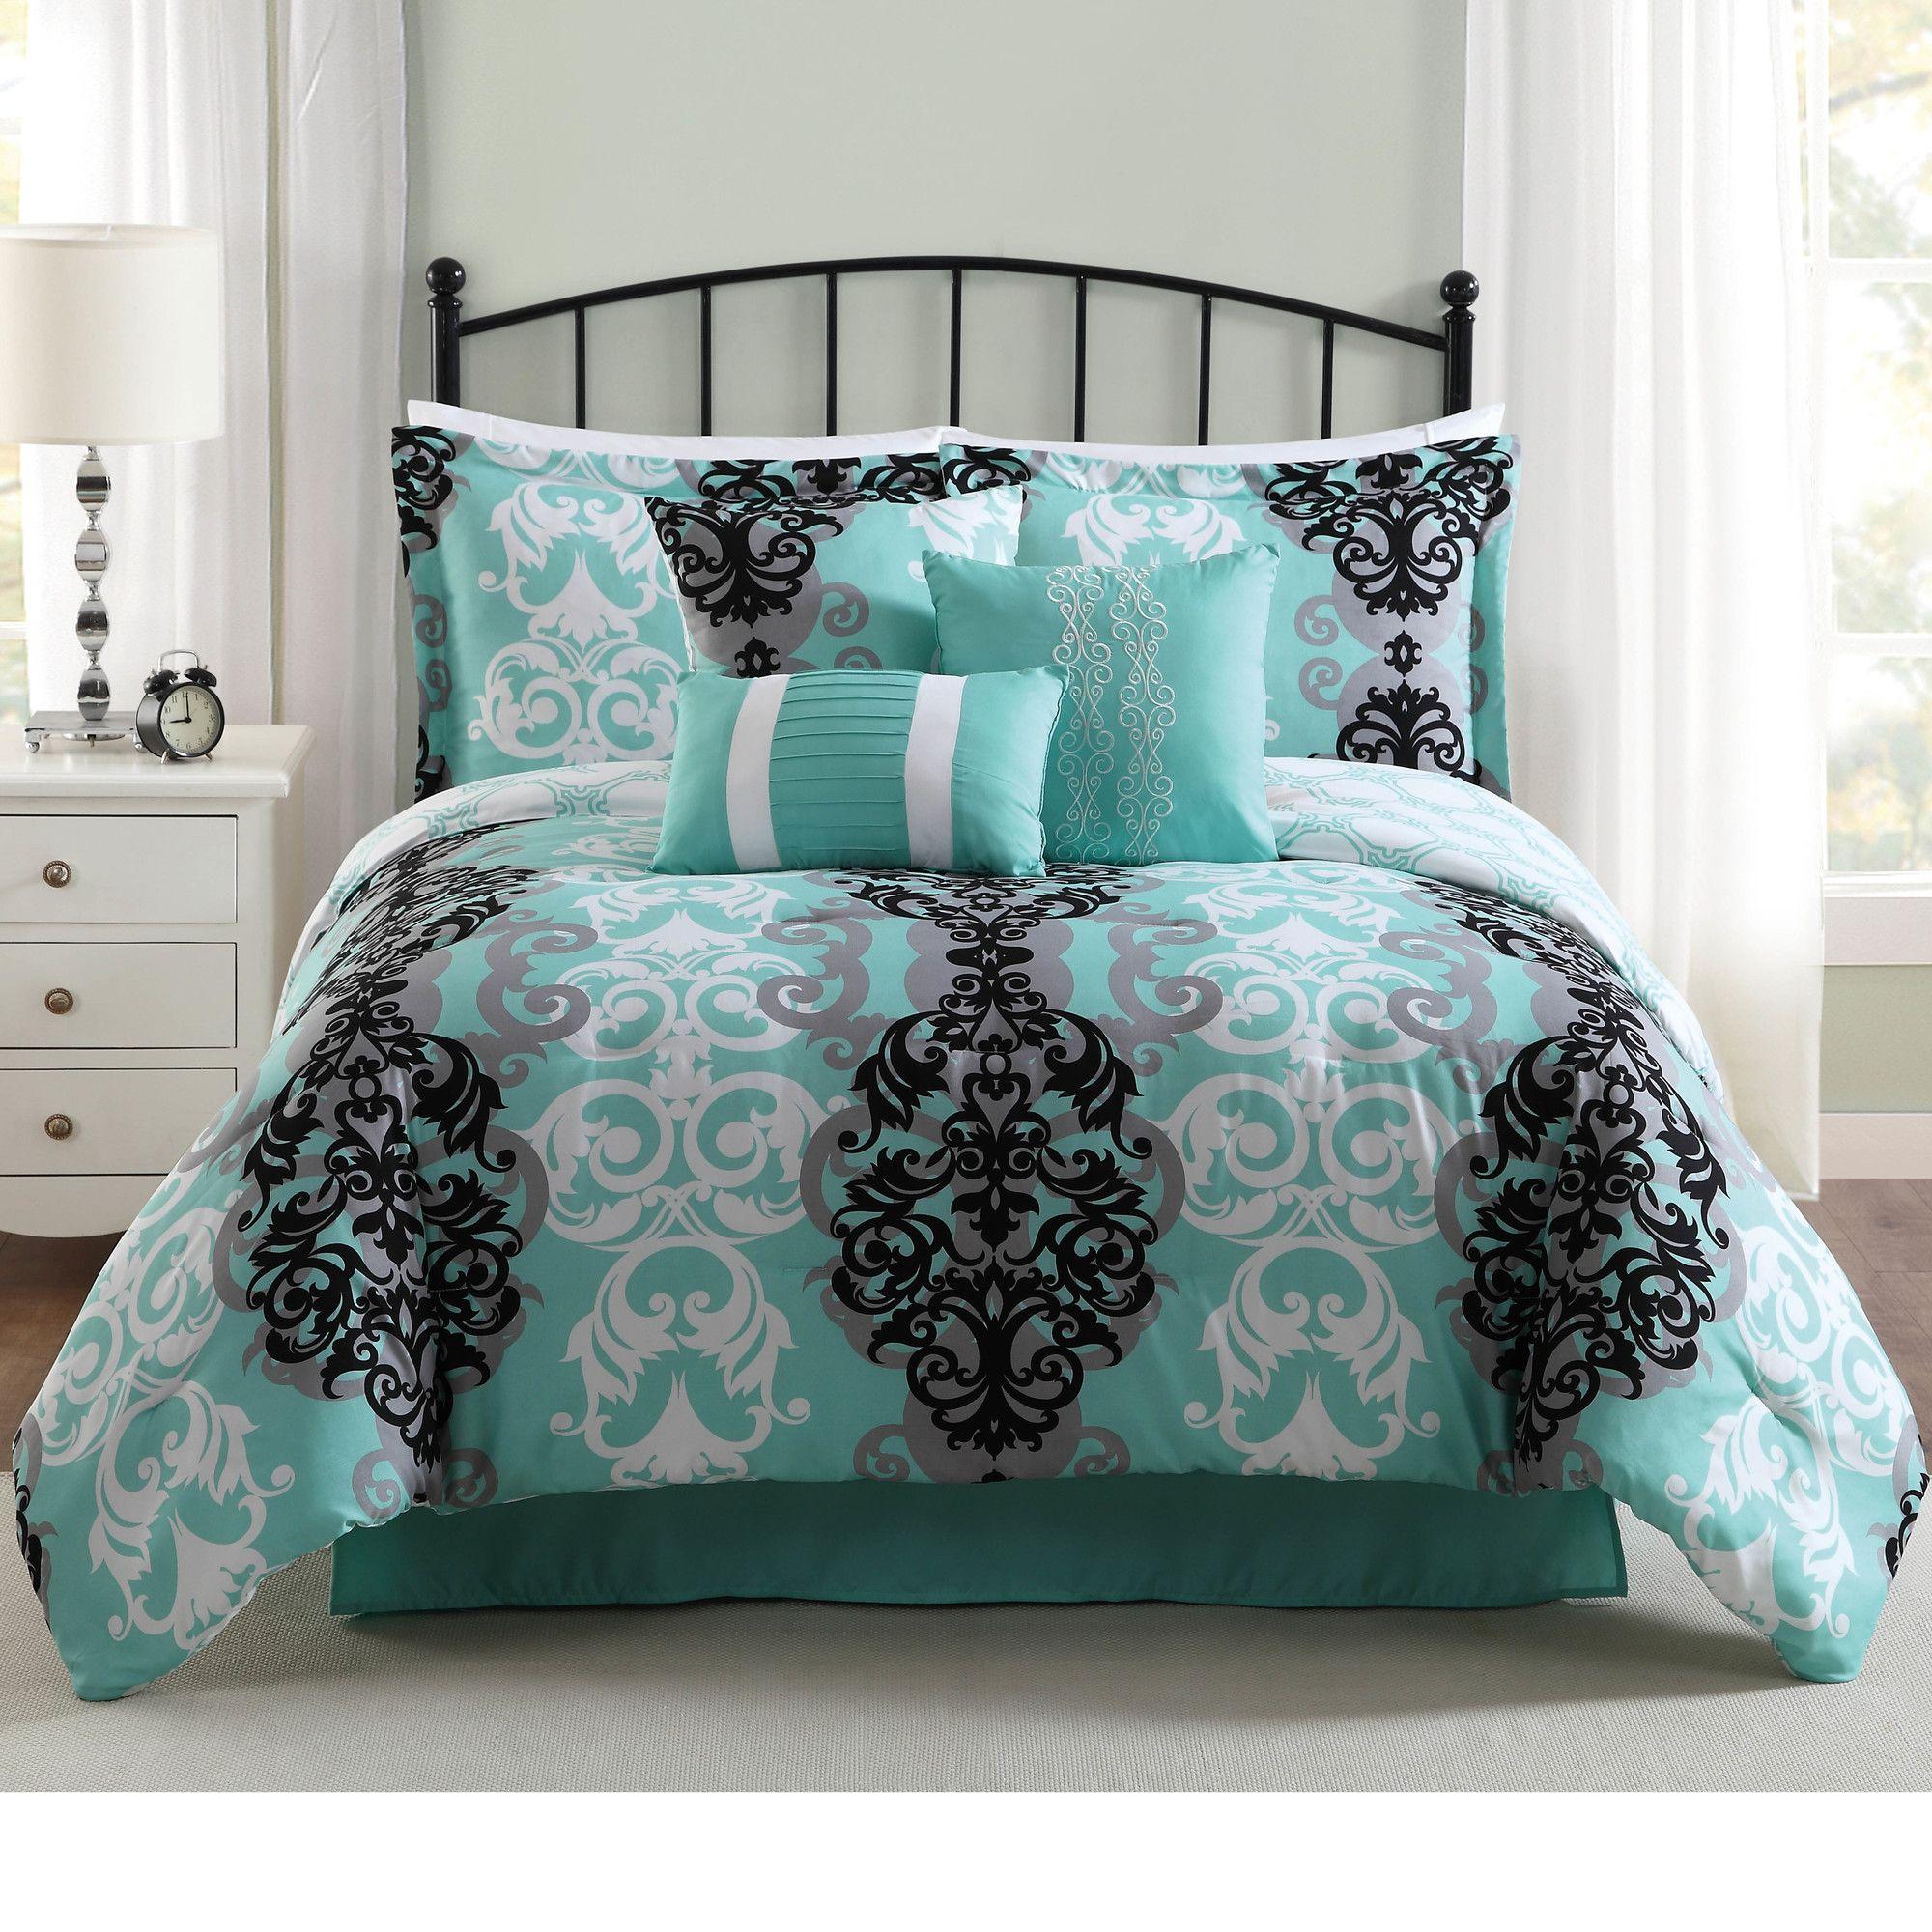 Downton 7 Piece Comforter Set Queen Bedding Sets Teal Bedding Sets Comforter Sets